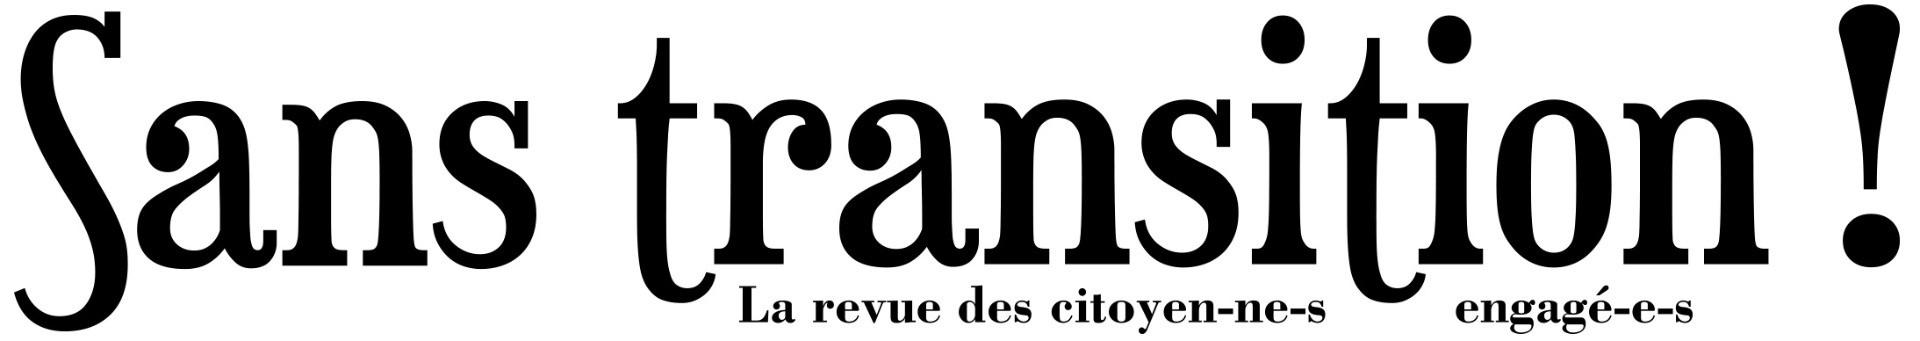 Sans transition ! Occitanie